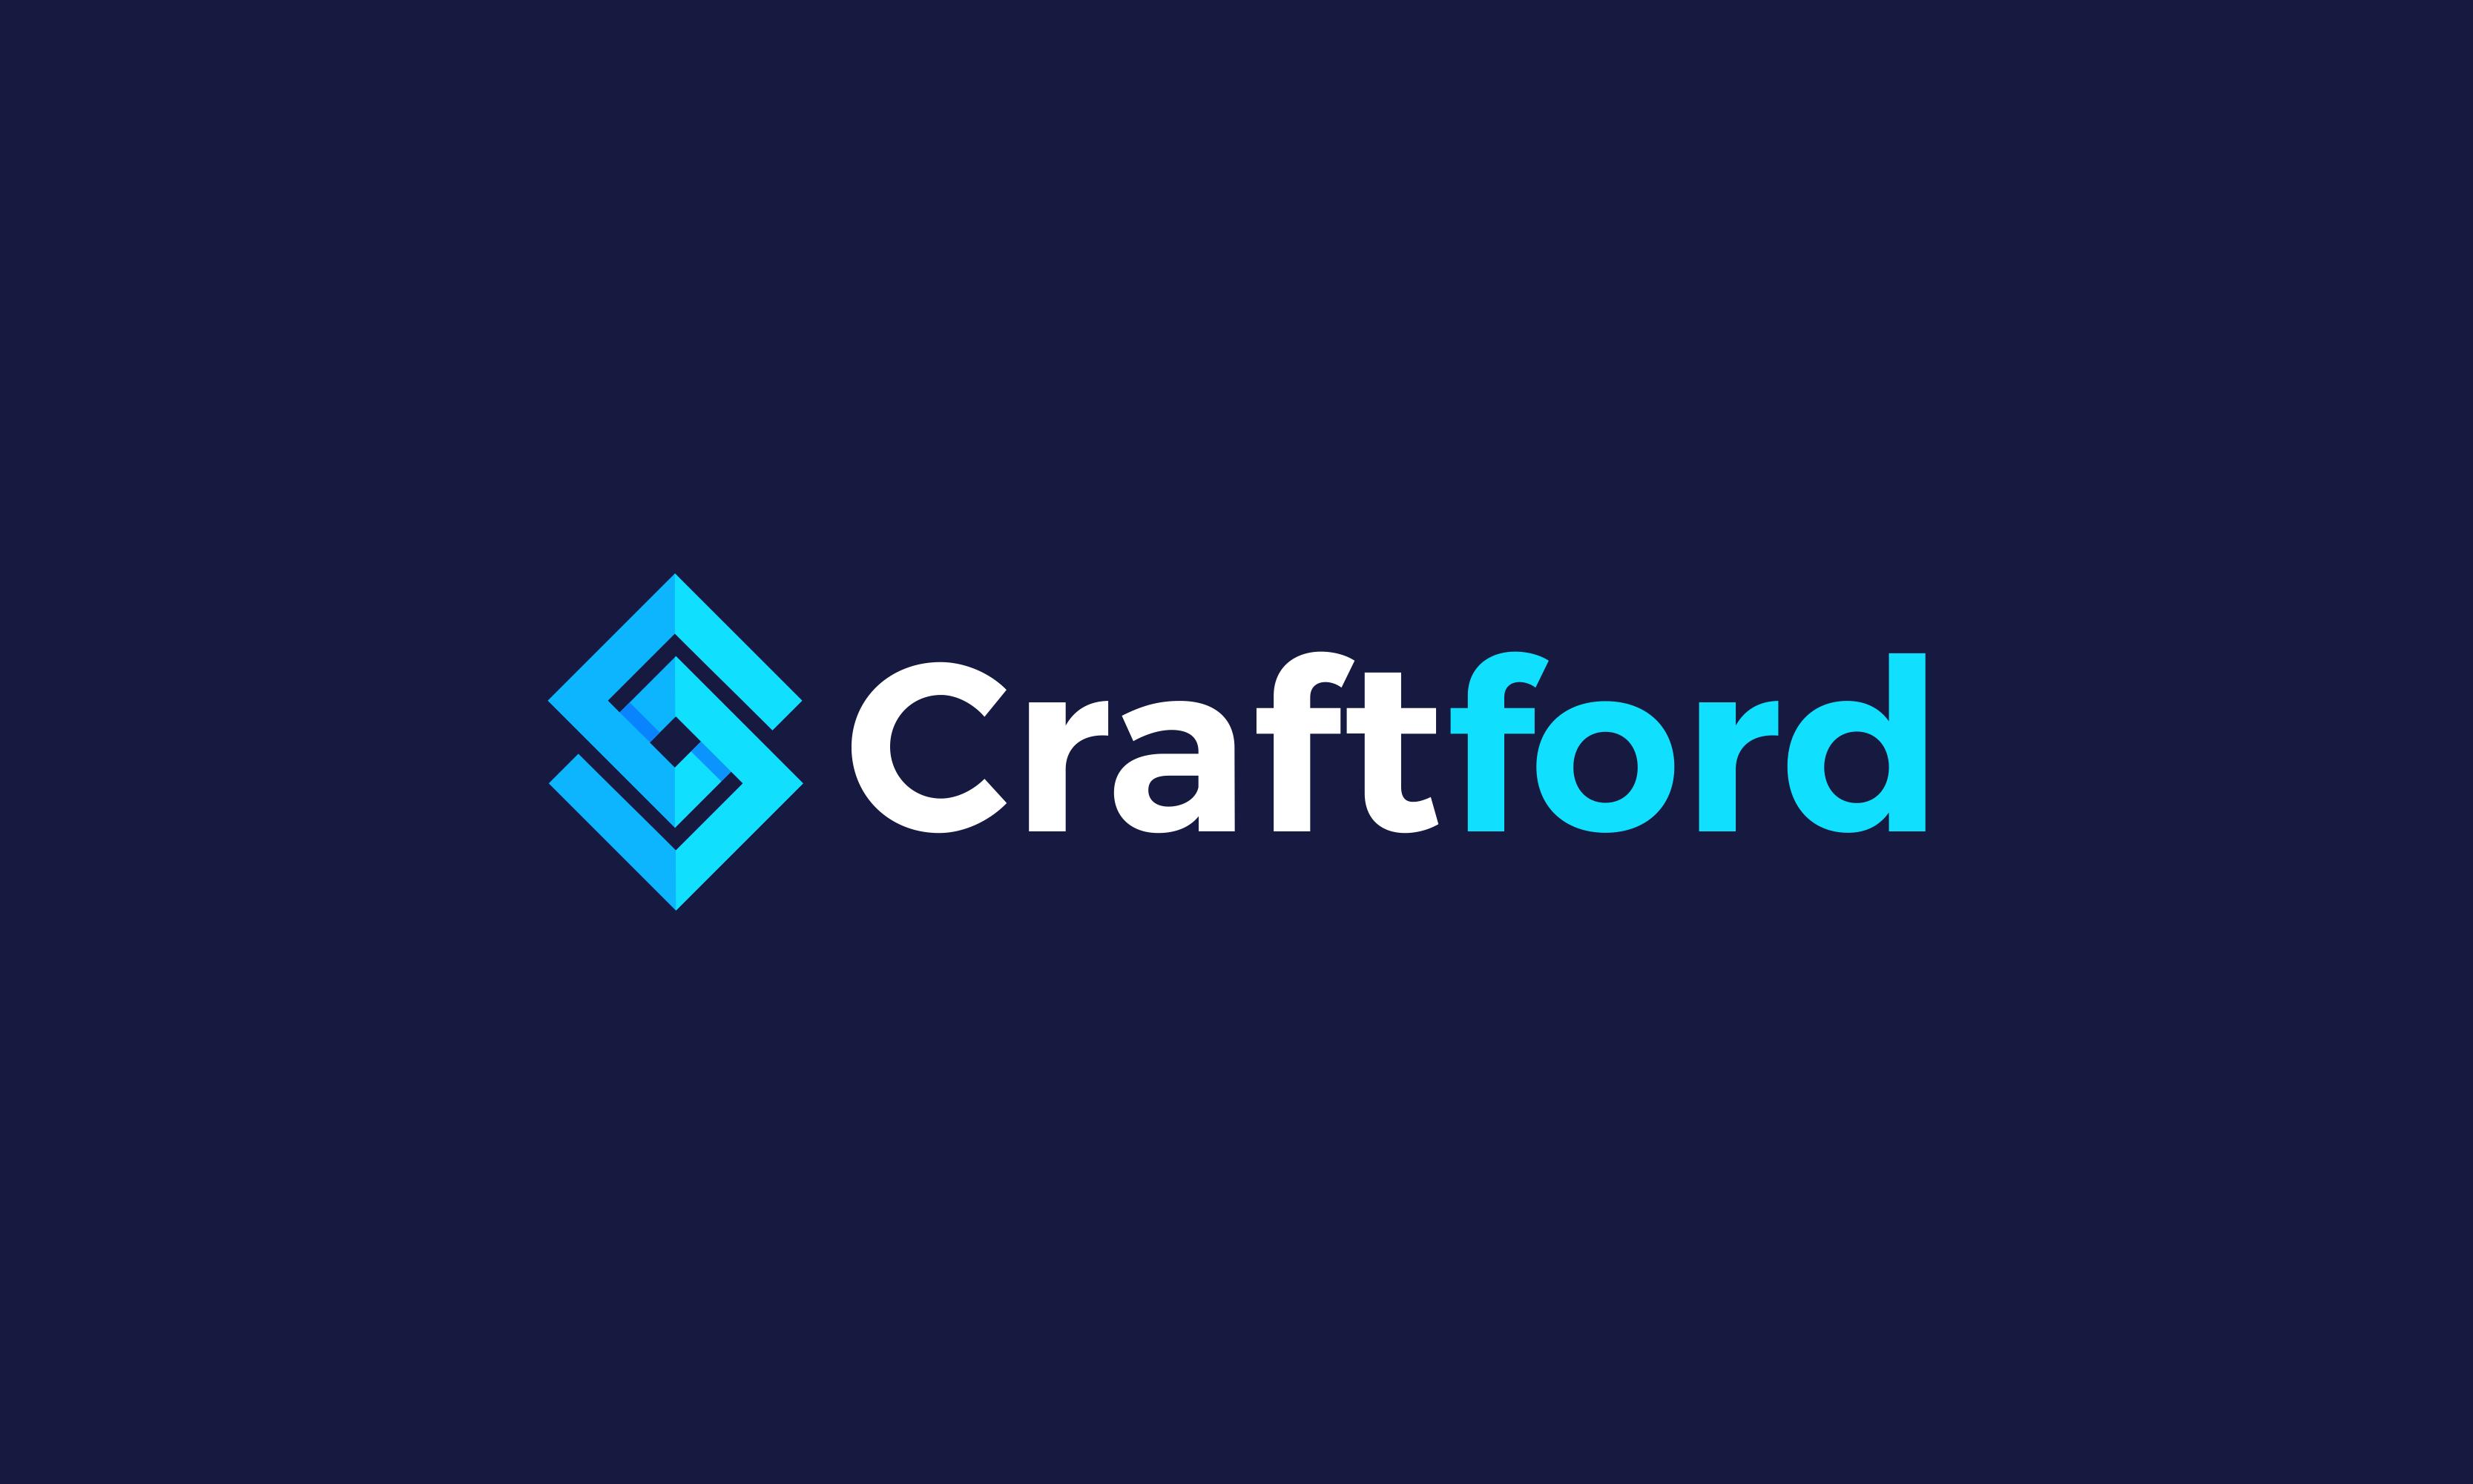 craftford